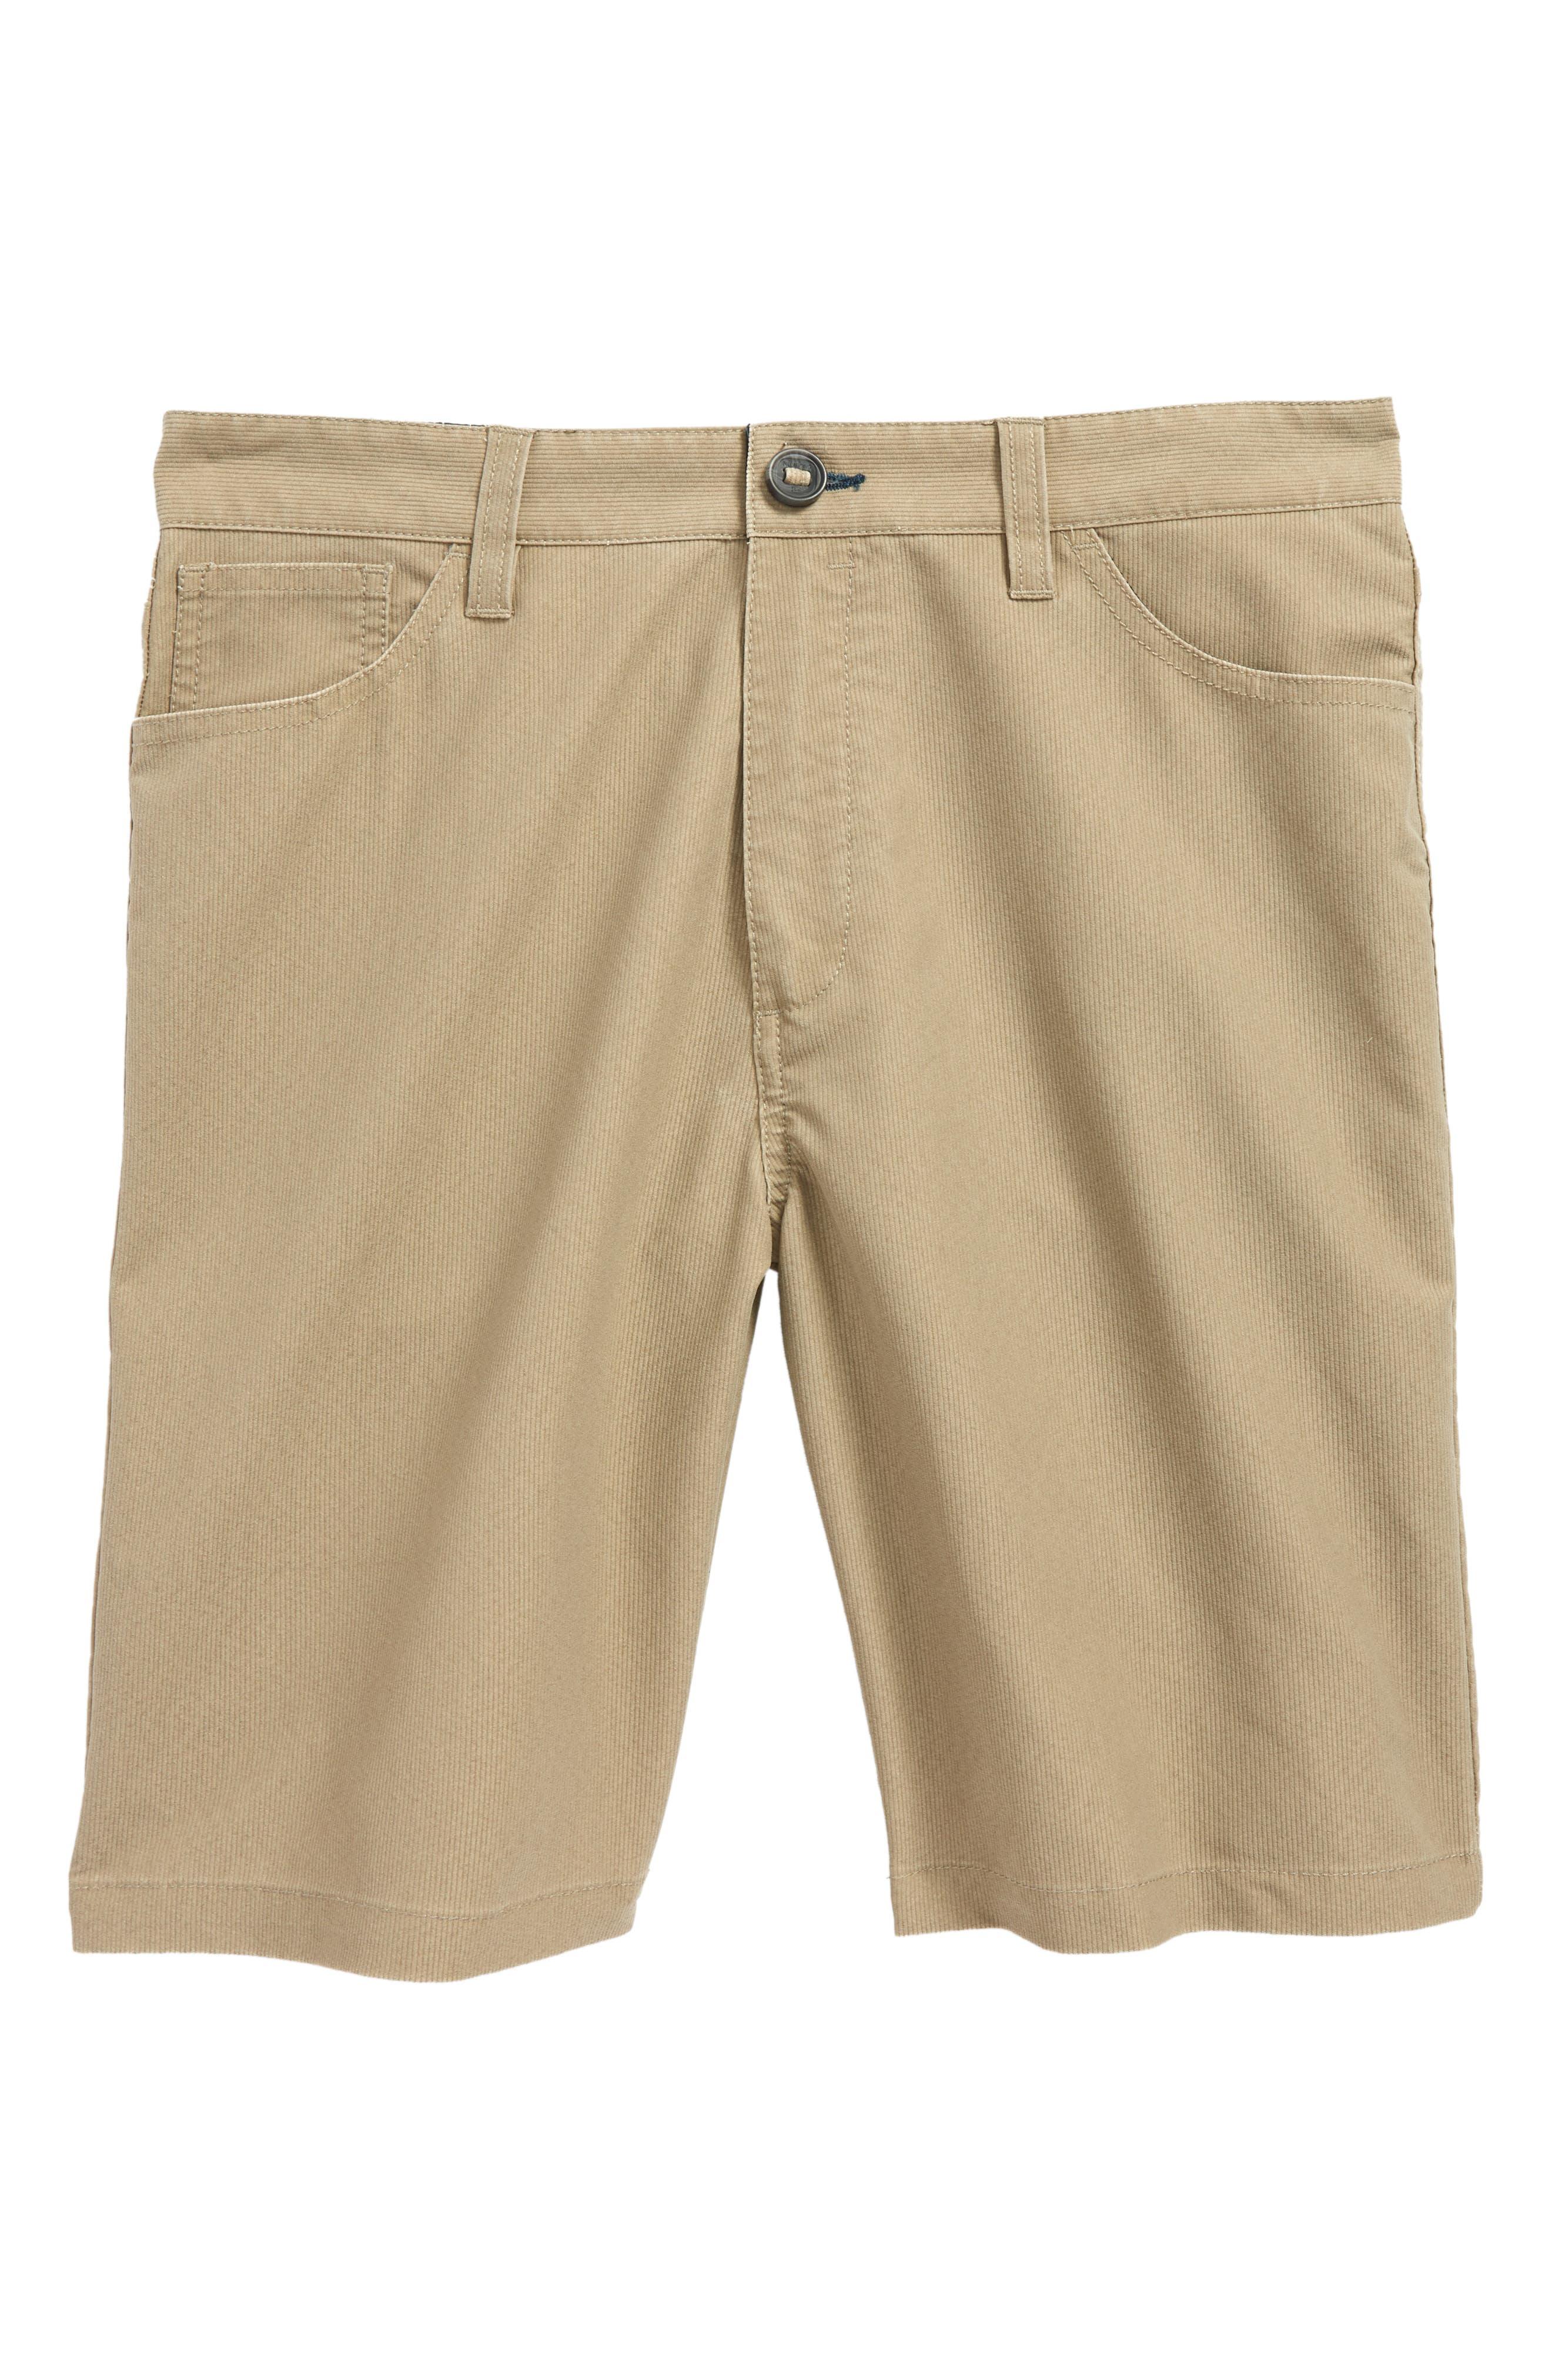 Outsider X Surf Corduroy Hybrid Shorts,                             Main thumbnail 1, color,                             Khaki